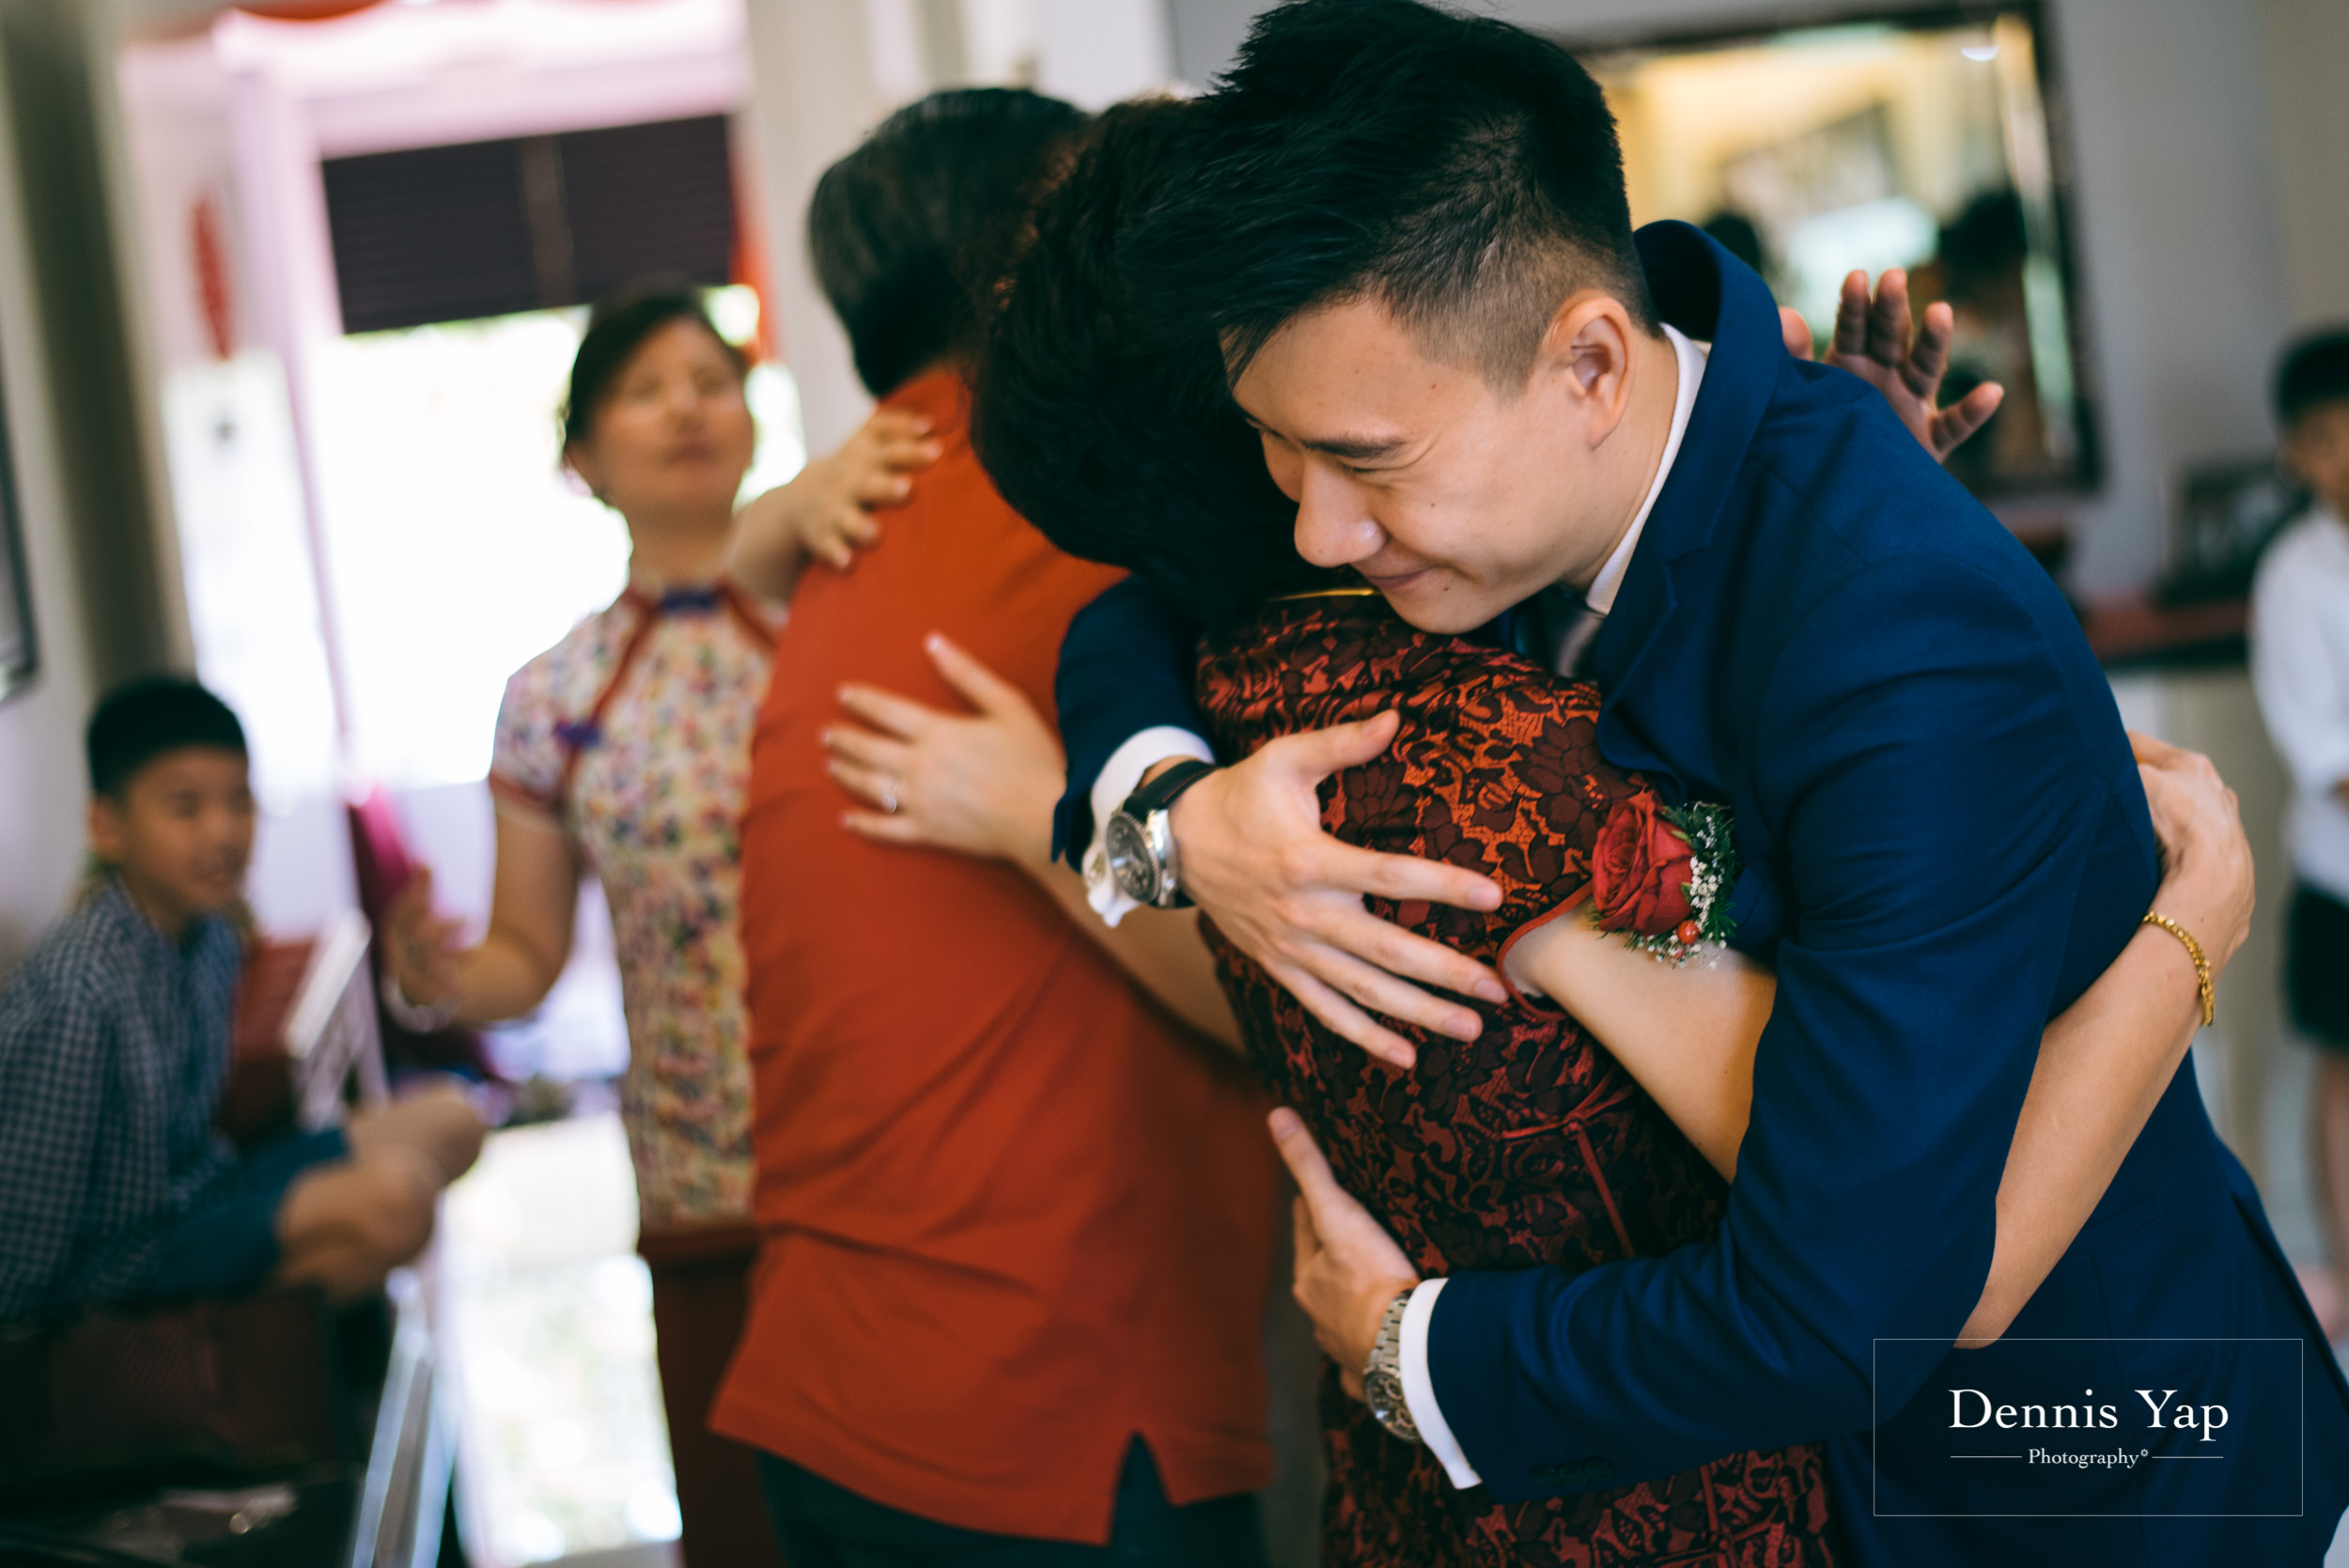 ethan juli wedding day gate crash wedding party dennis yap photography colors-40.jpg